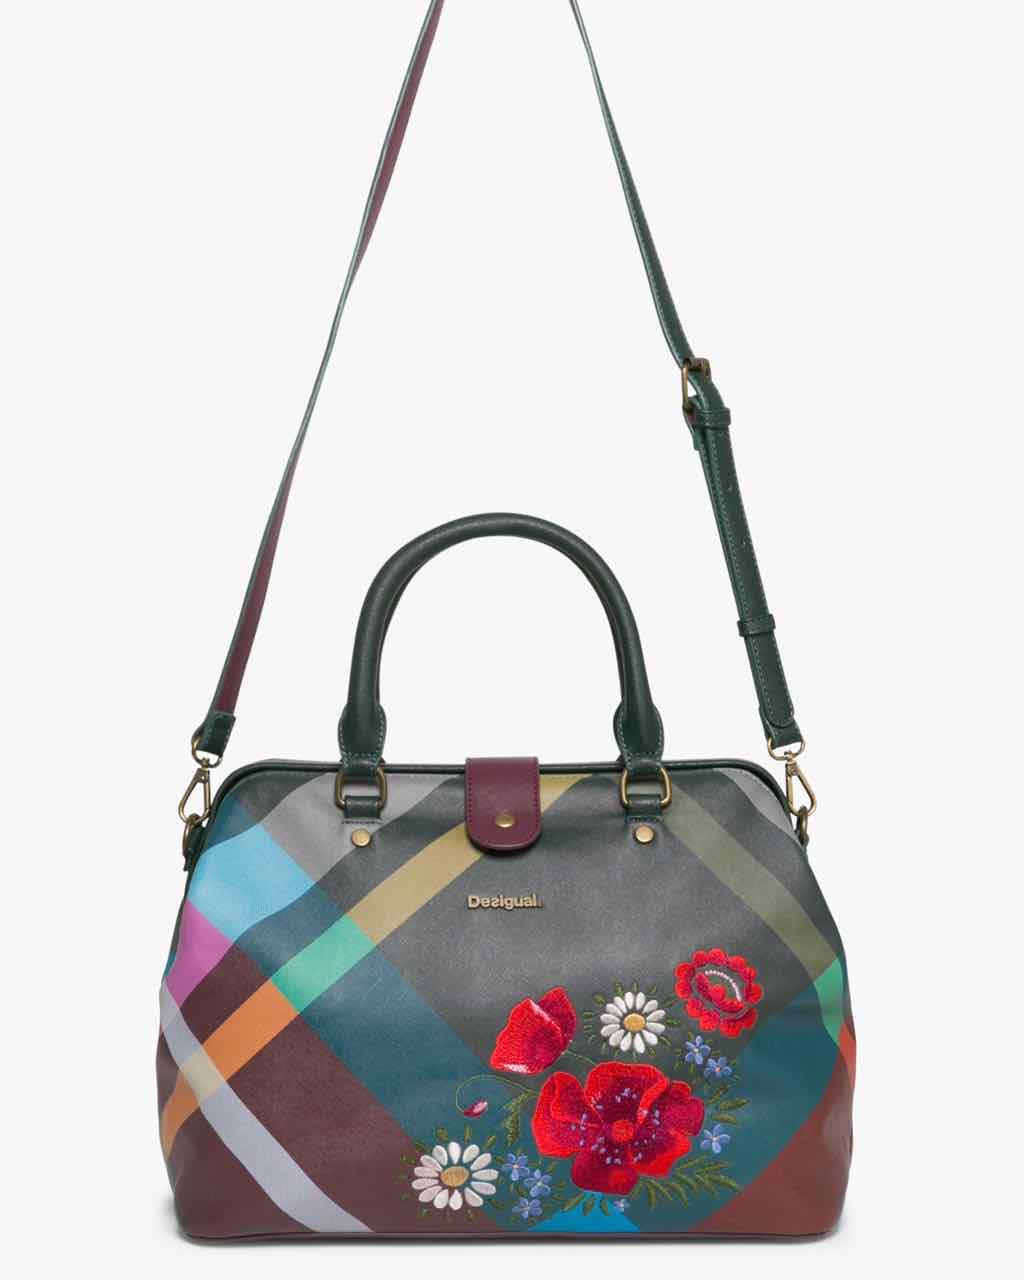 17WAXPEH_4003 Desigual Bag Nicaragua Madras Folk Flores Buy Online